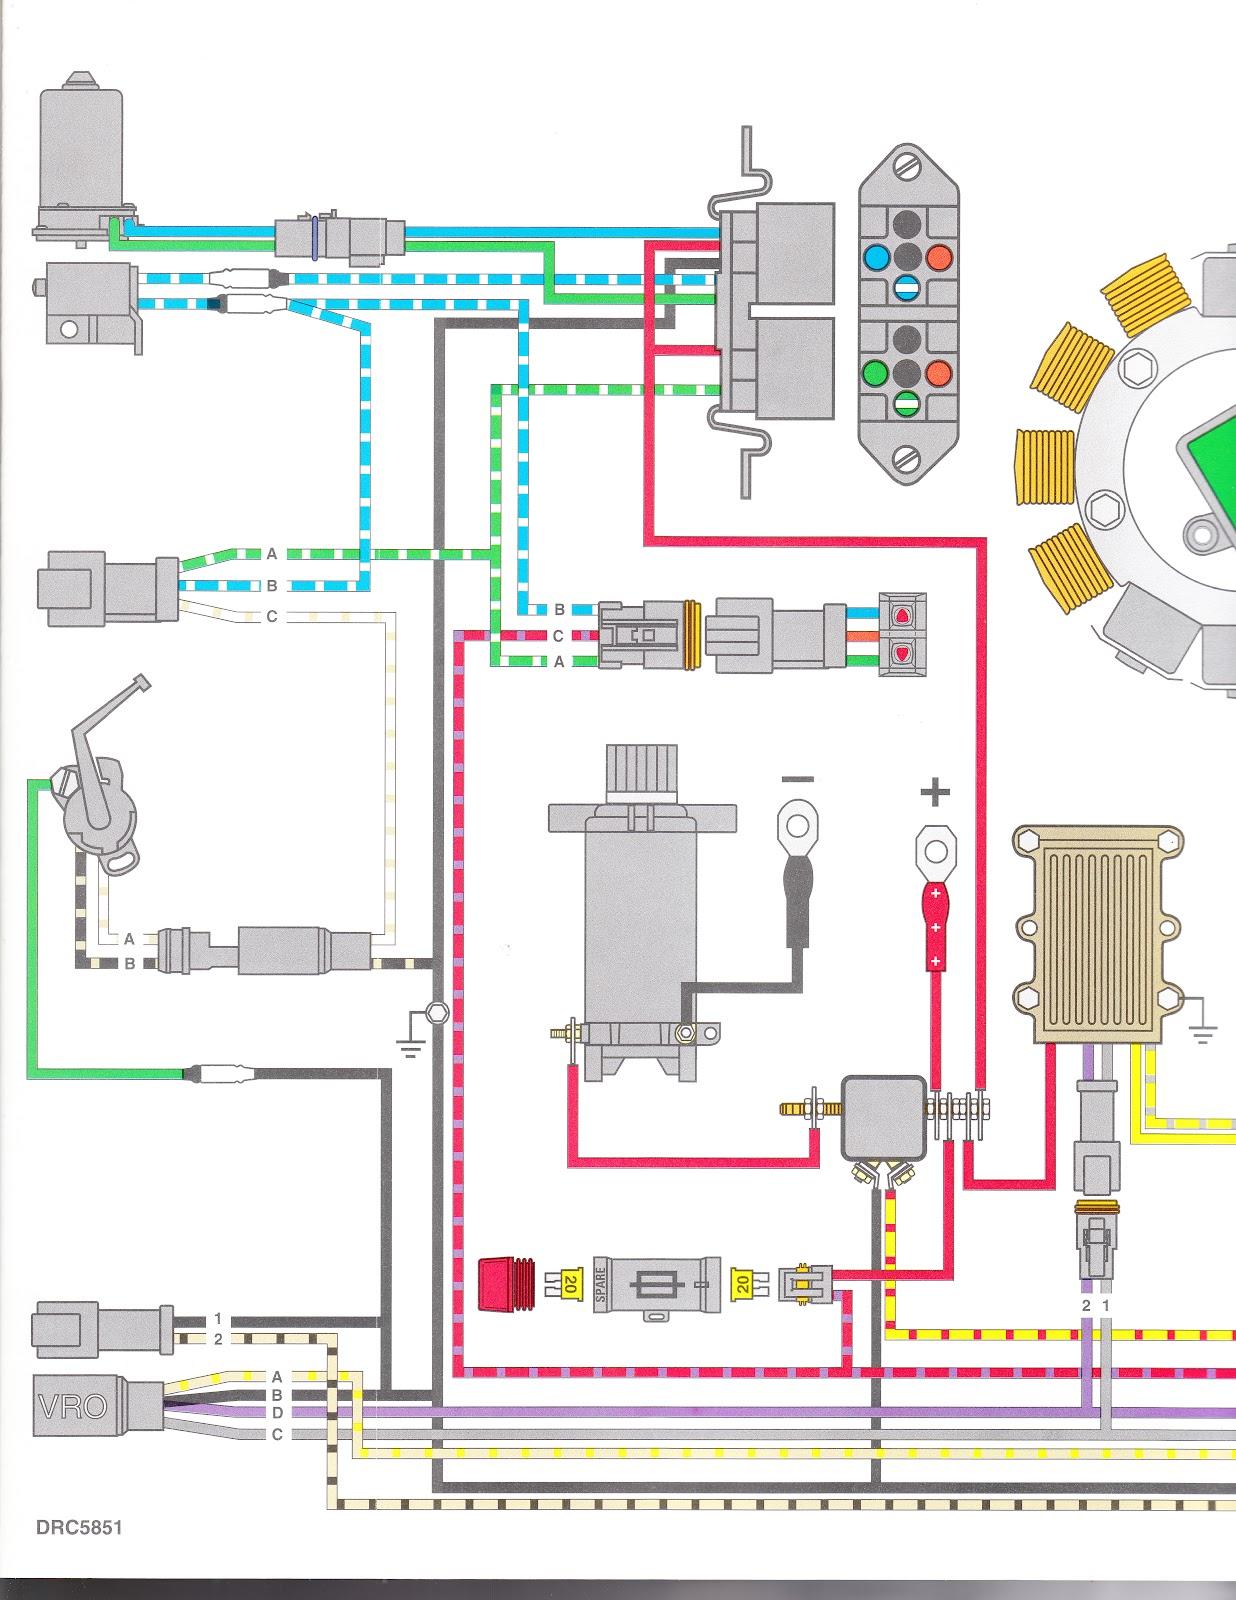 1977 evinrude wiring diagram 96' oceanrunner 115 tilt trim problem page: 1 - iboats ... 1998 evinrude wiring diagram